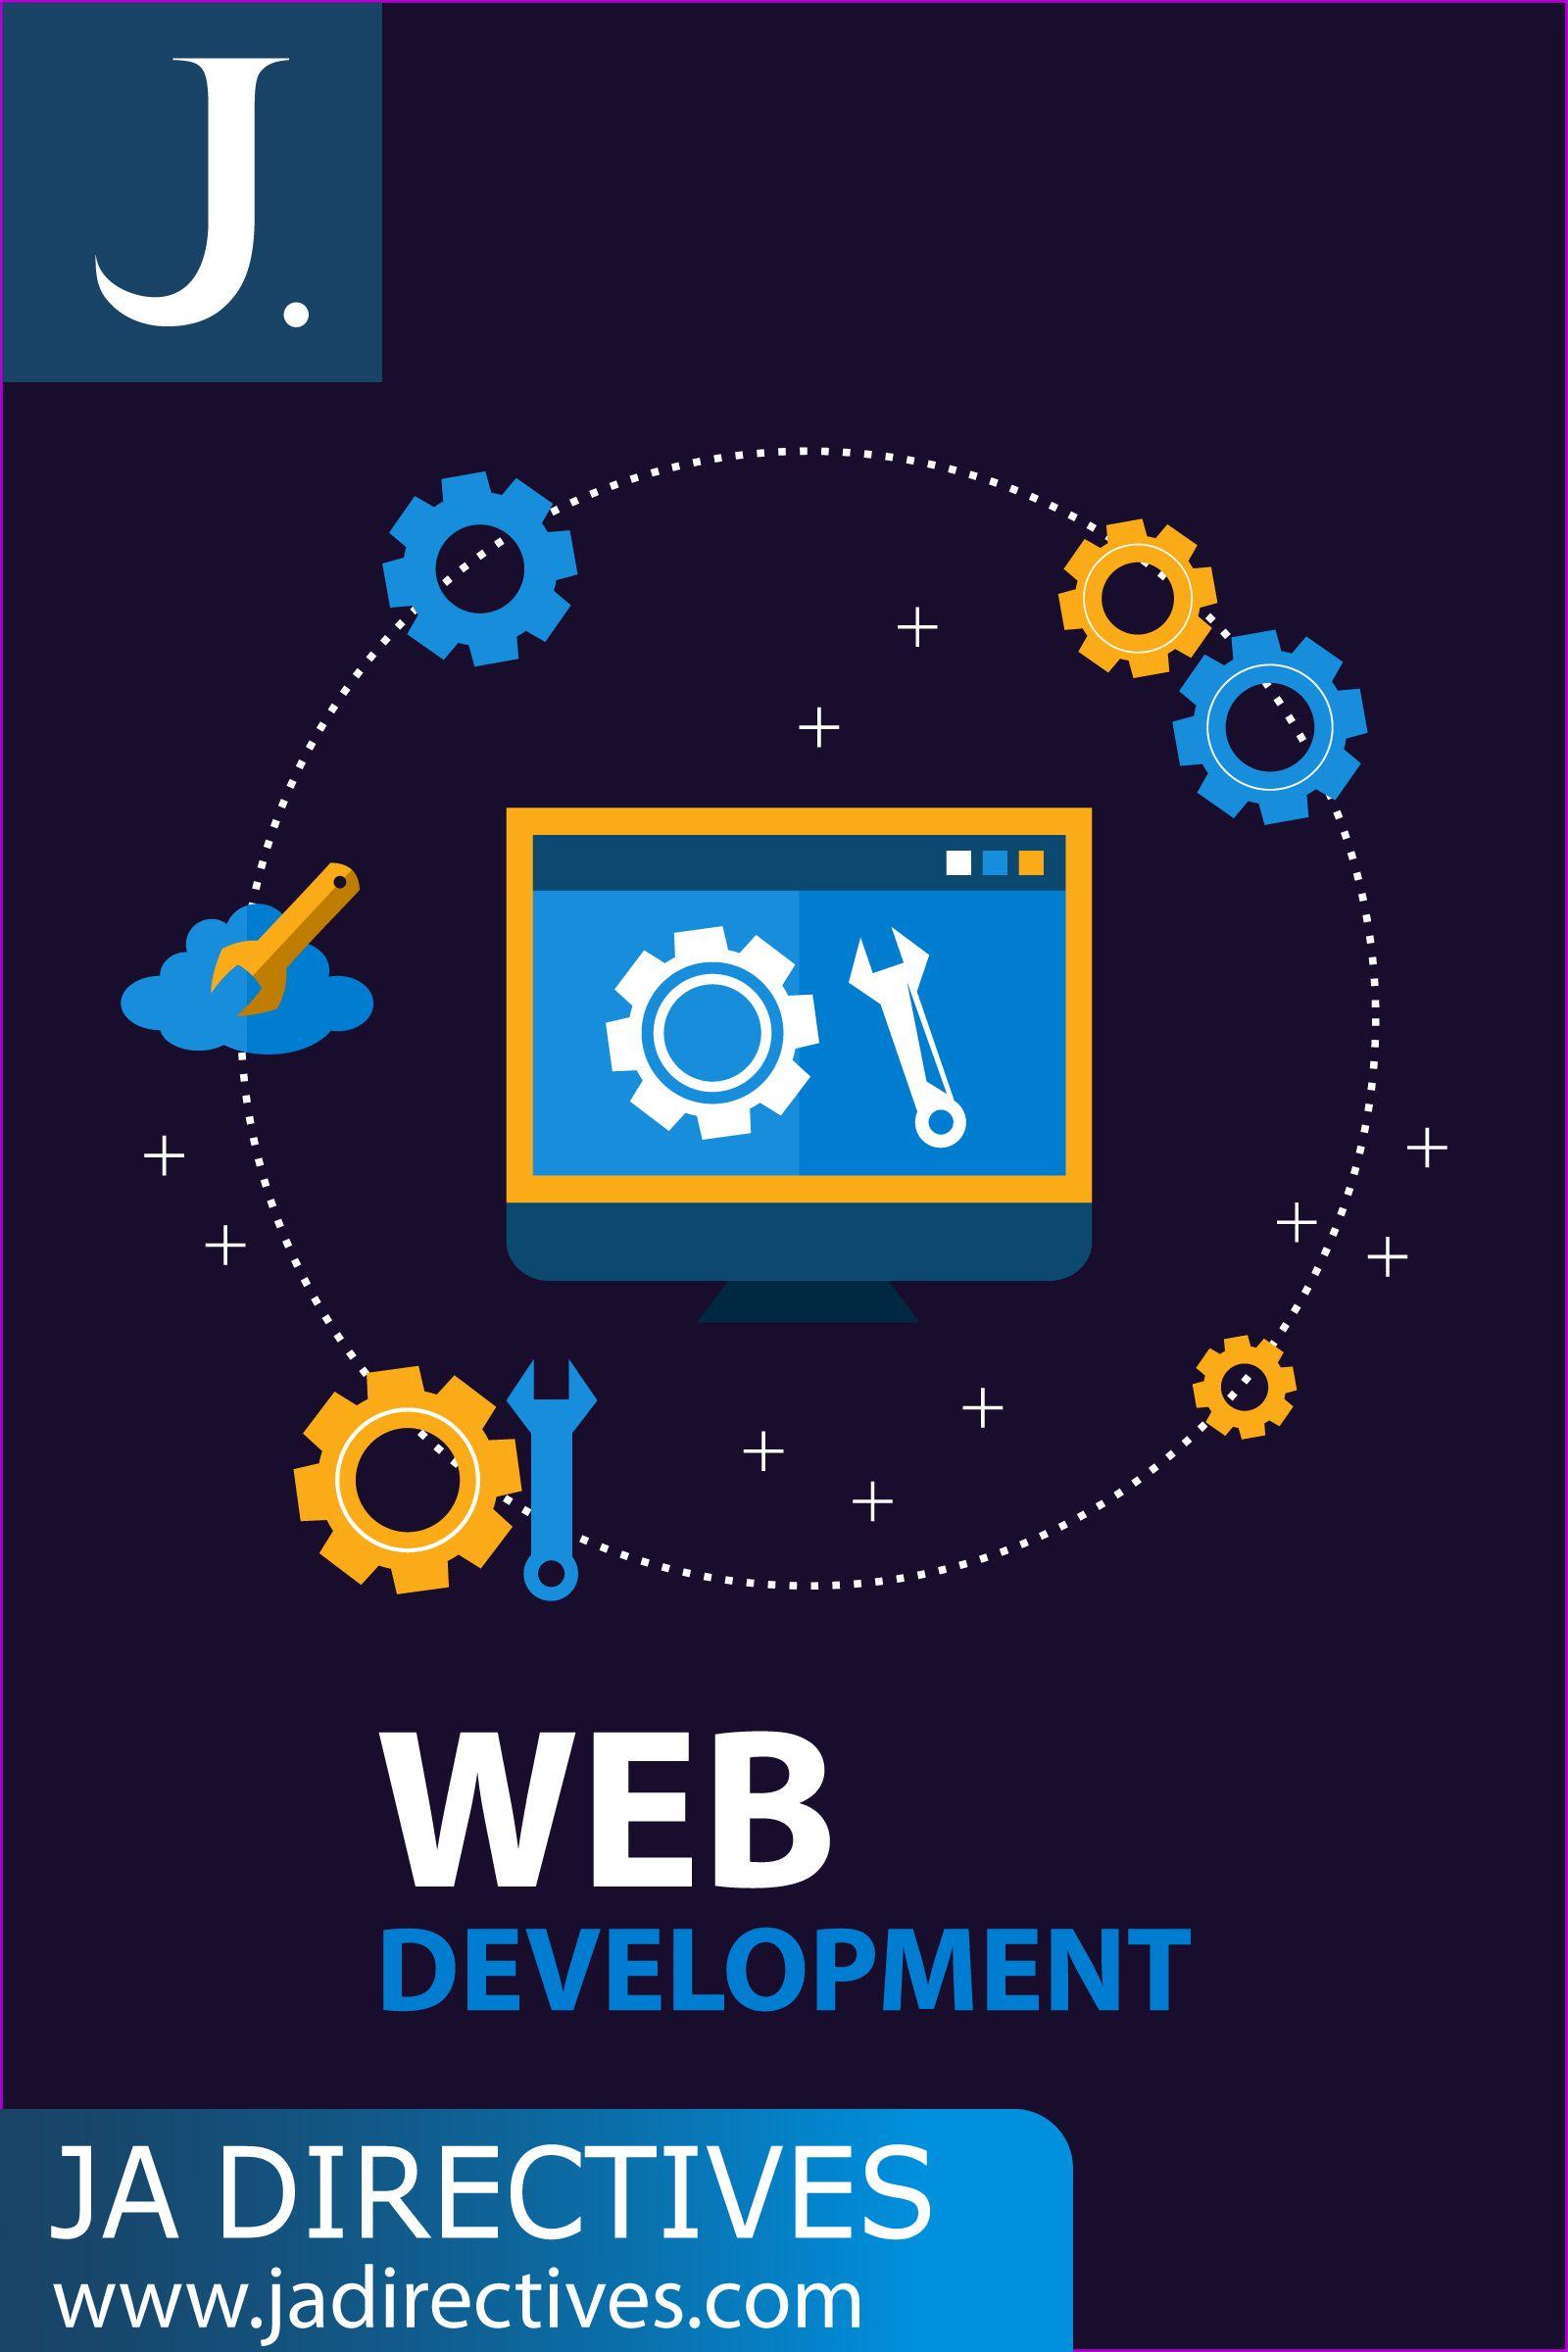 19 Best Web Development Courses Tutorials And Training 2020 In 2020 With Images Web Development Course Web Development Development